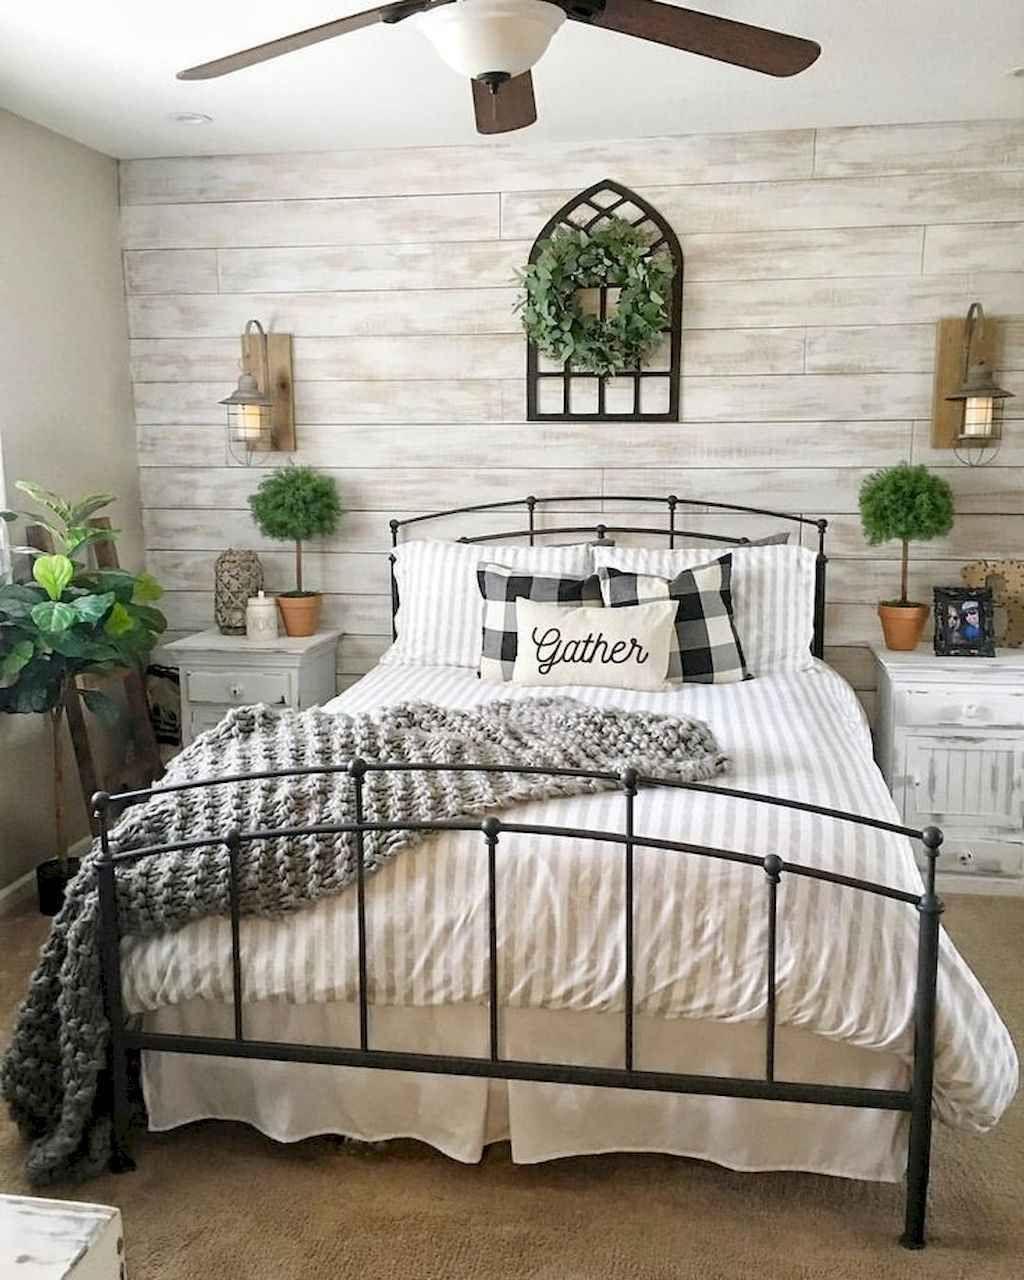 38 Modern Farmhouse Bedroom Decorating Ideas #modernfarmhousebedroom